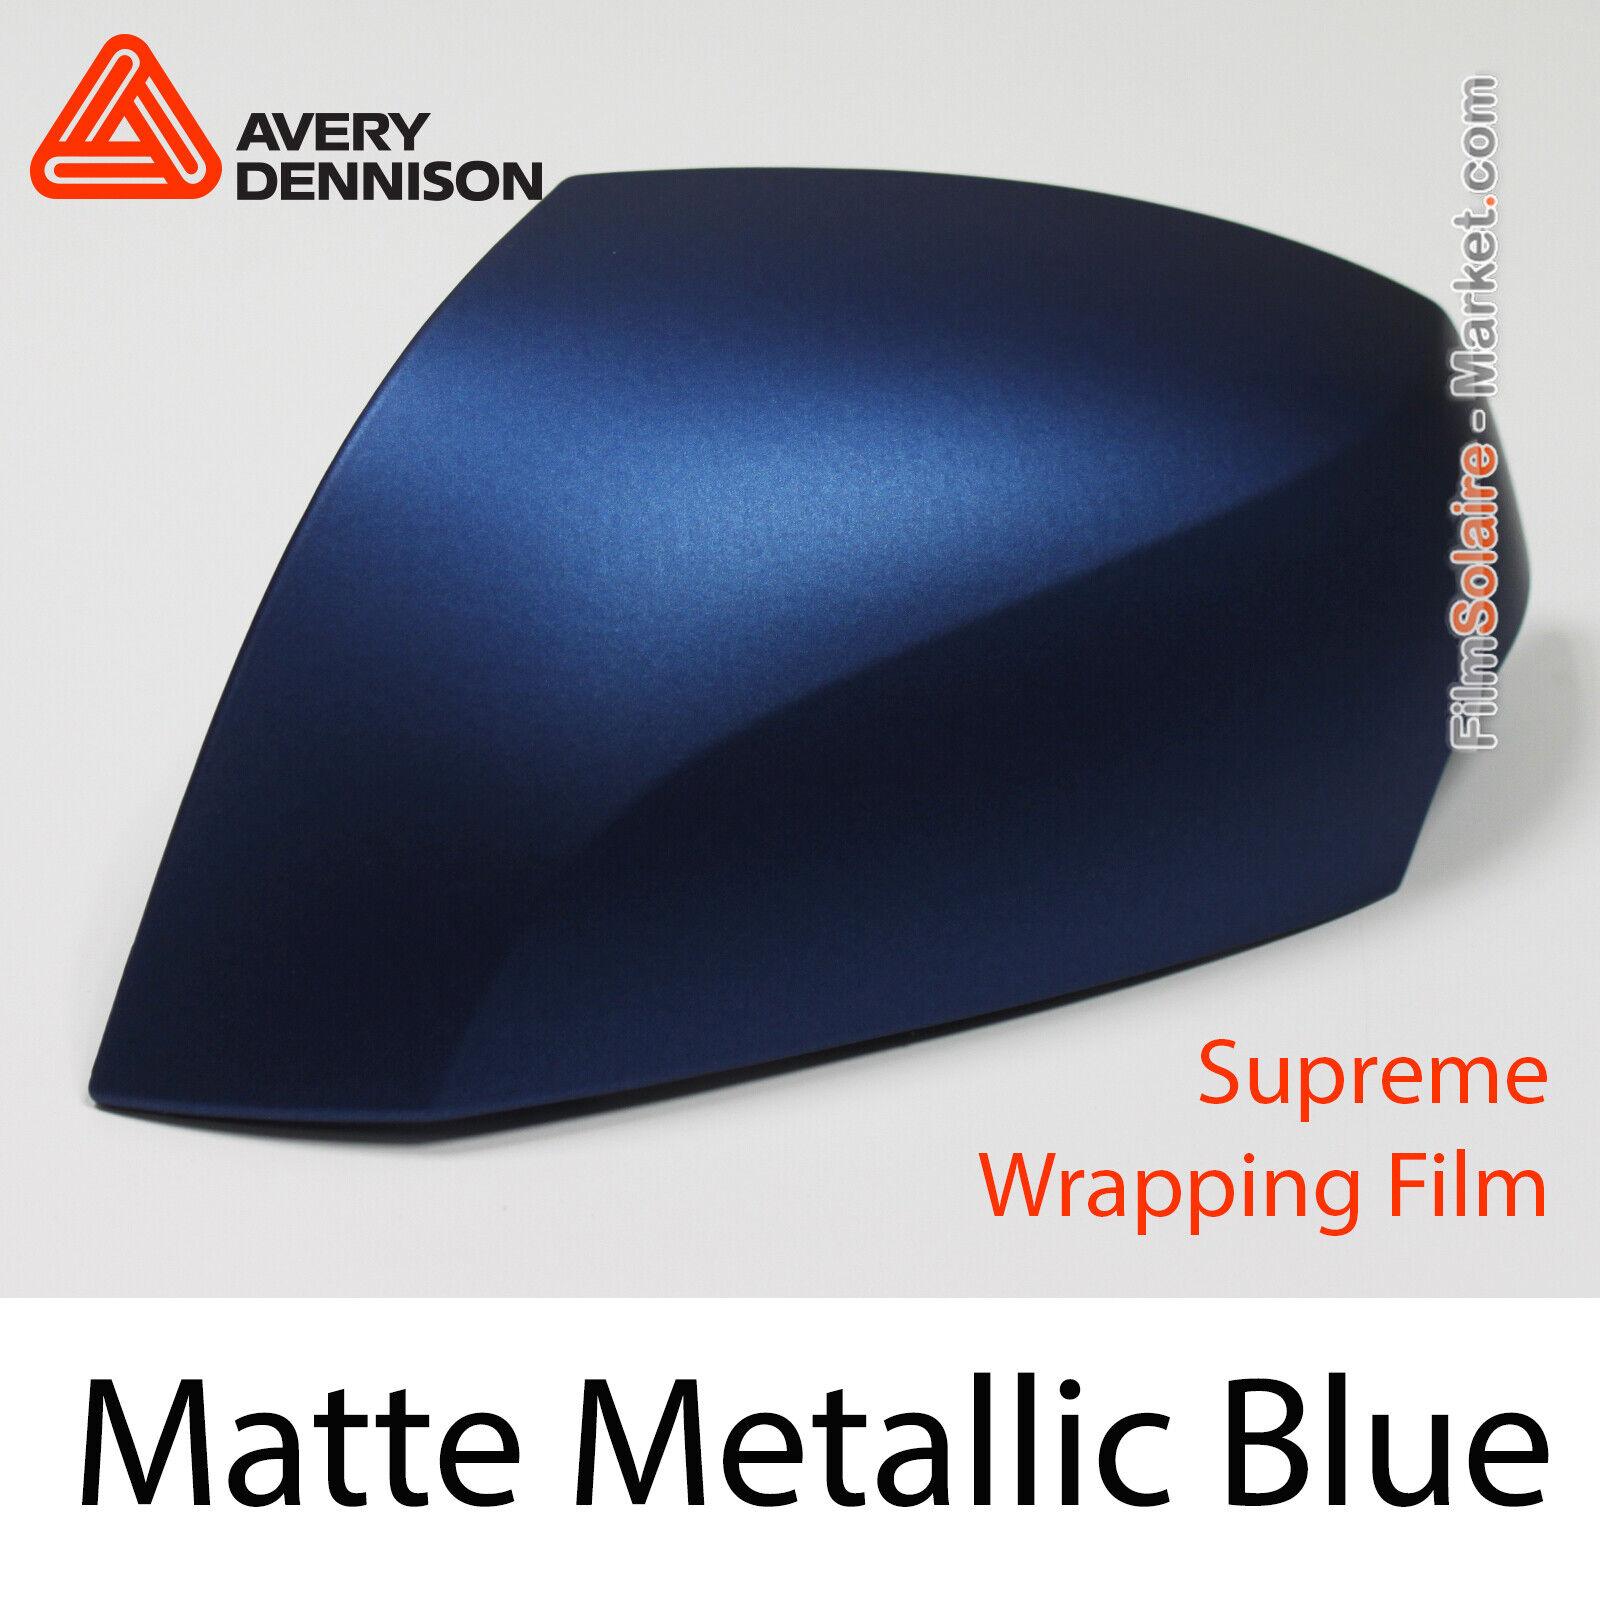 Matte Metallic Blau, Avery Dennison Supreme Wrapping Film, AS9080001